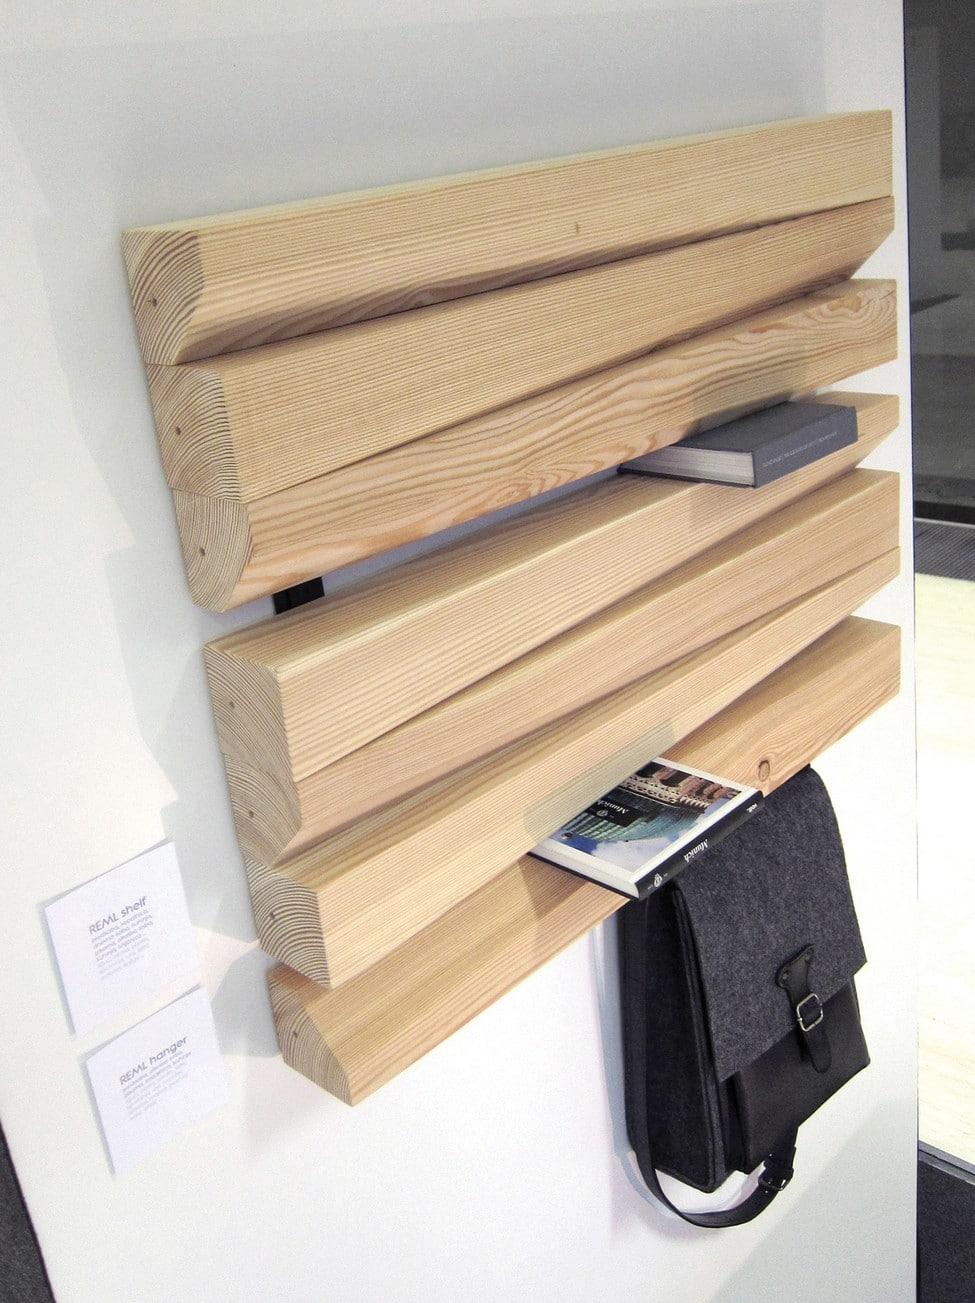 Dise o de estante de madera estanter a moderna y versatil for Disenos de espejos tallados en madera